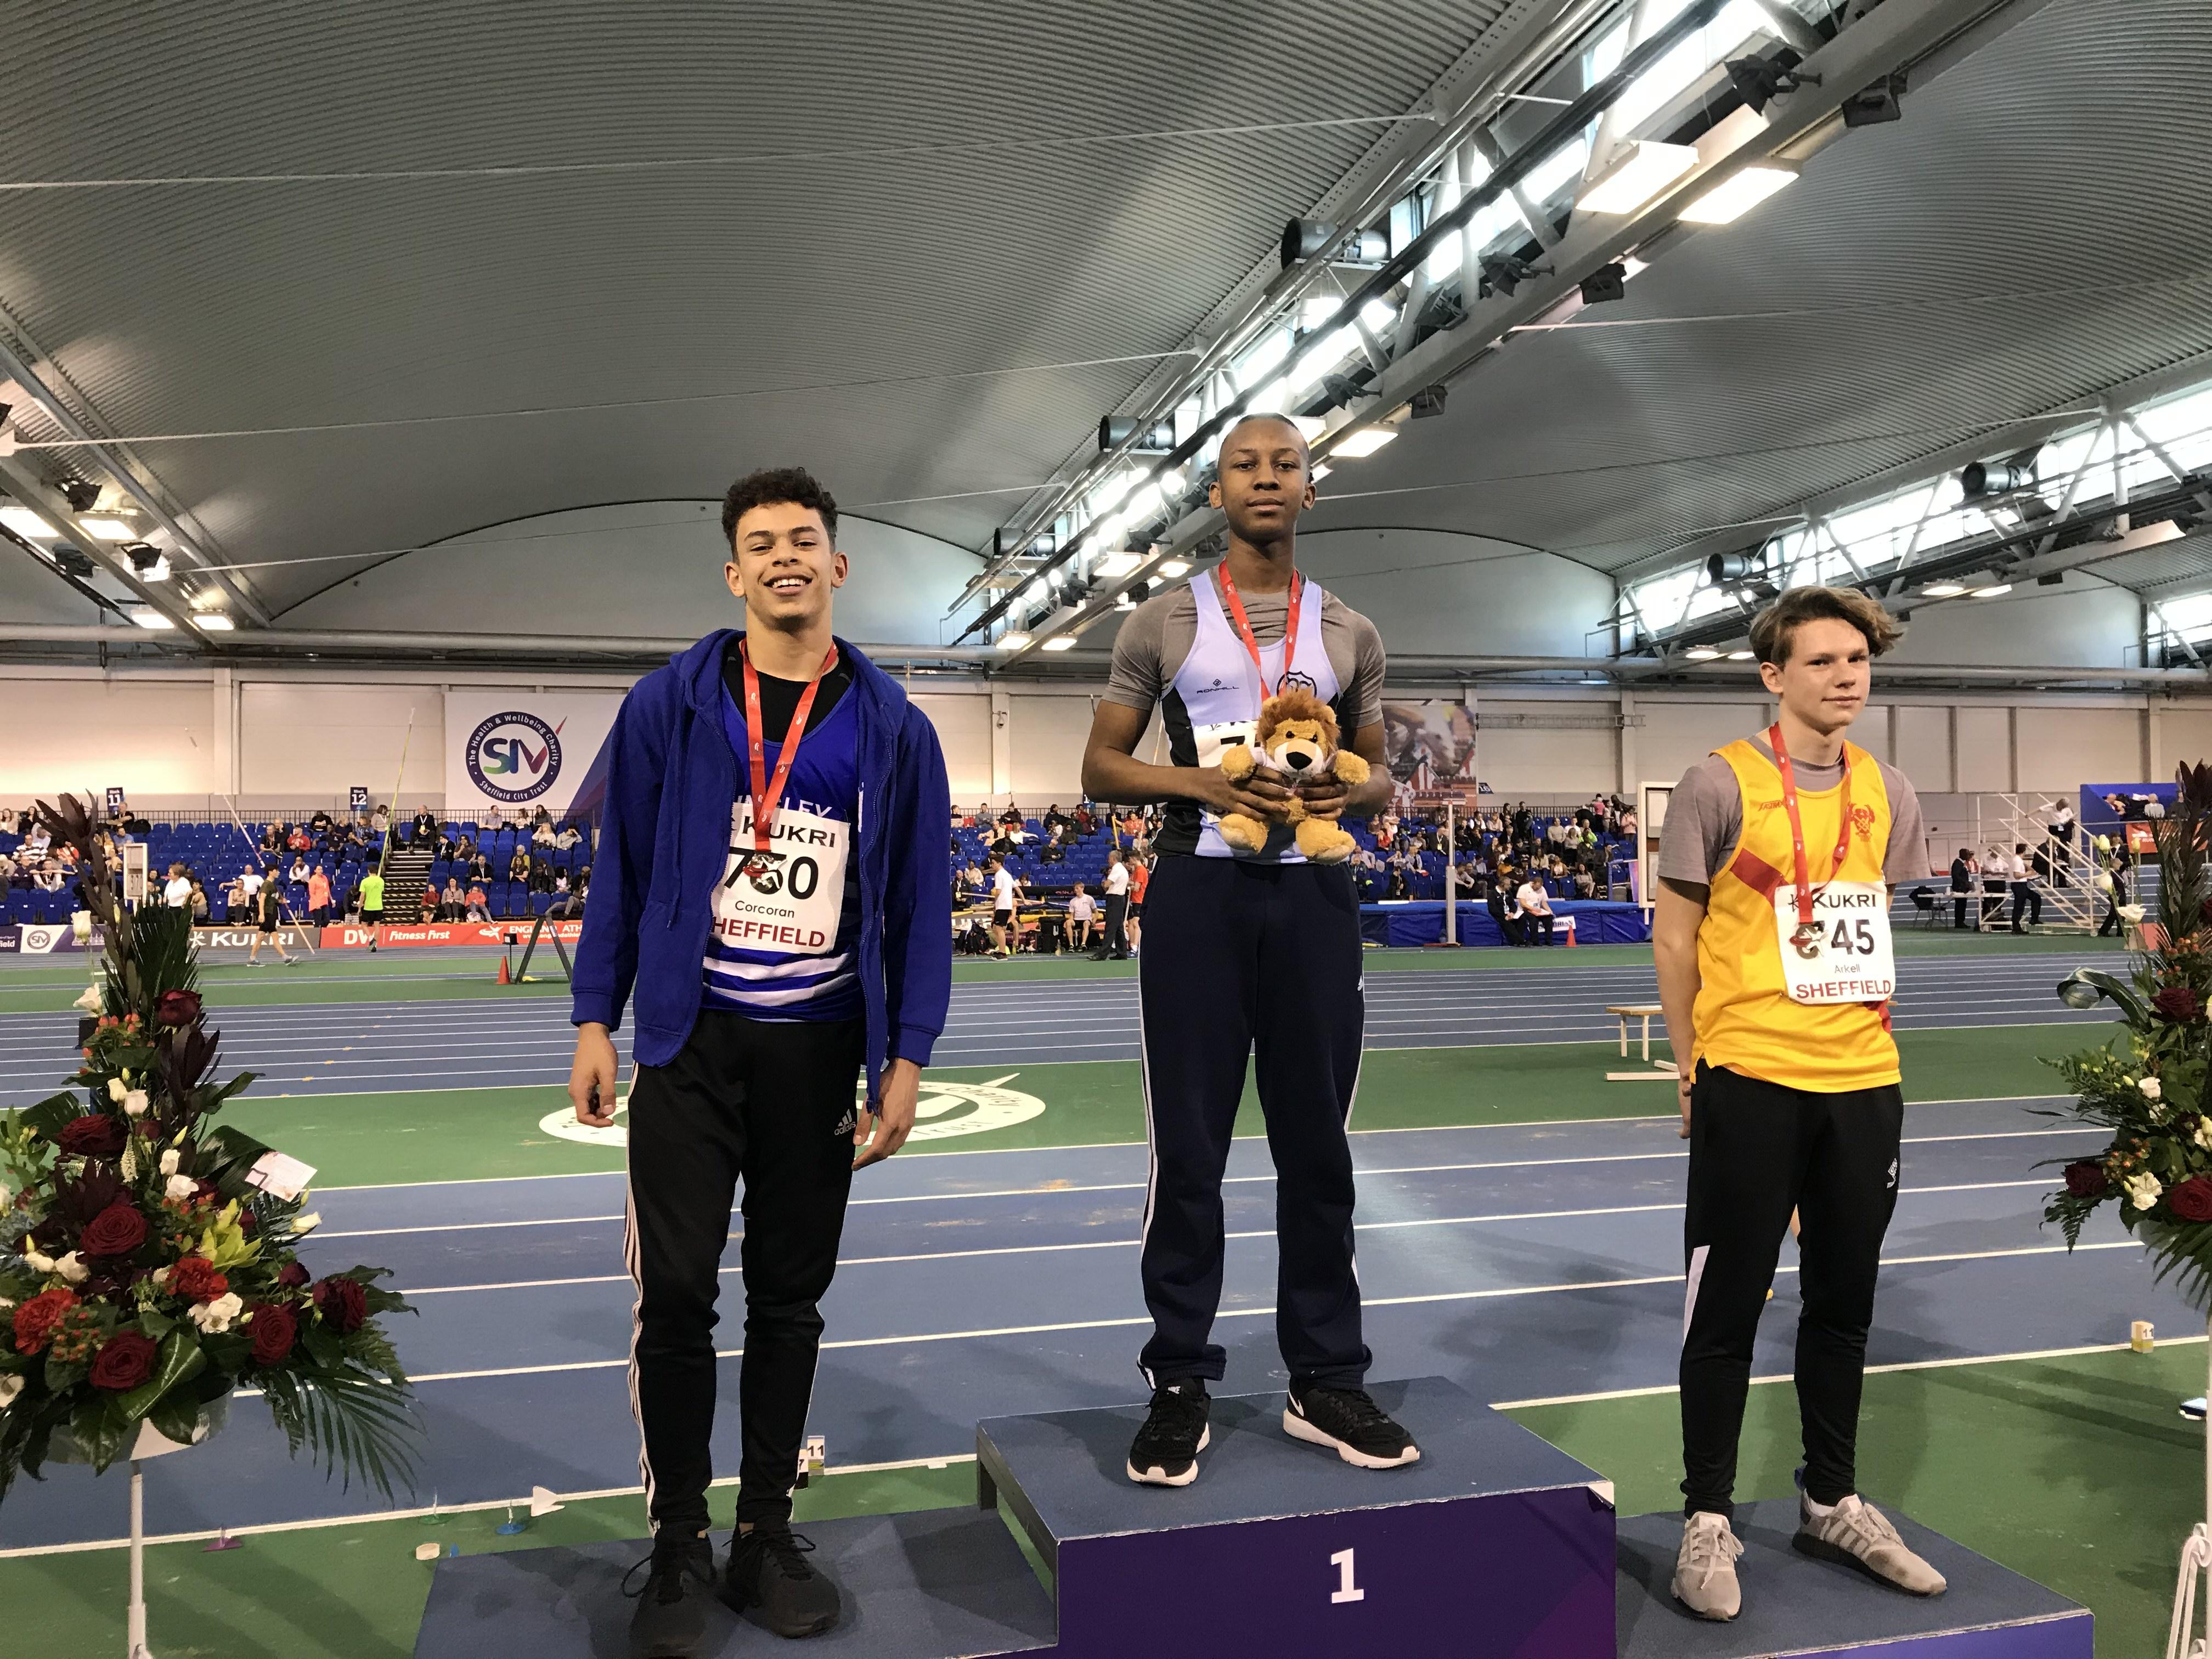 Harrier Gold at Indoor Championships!